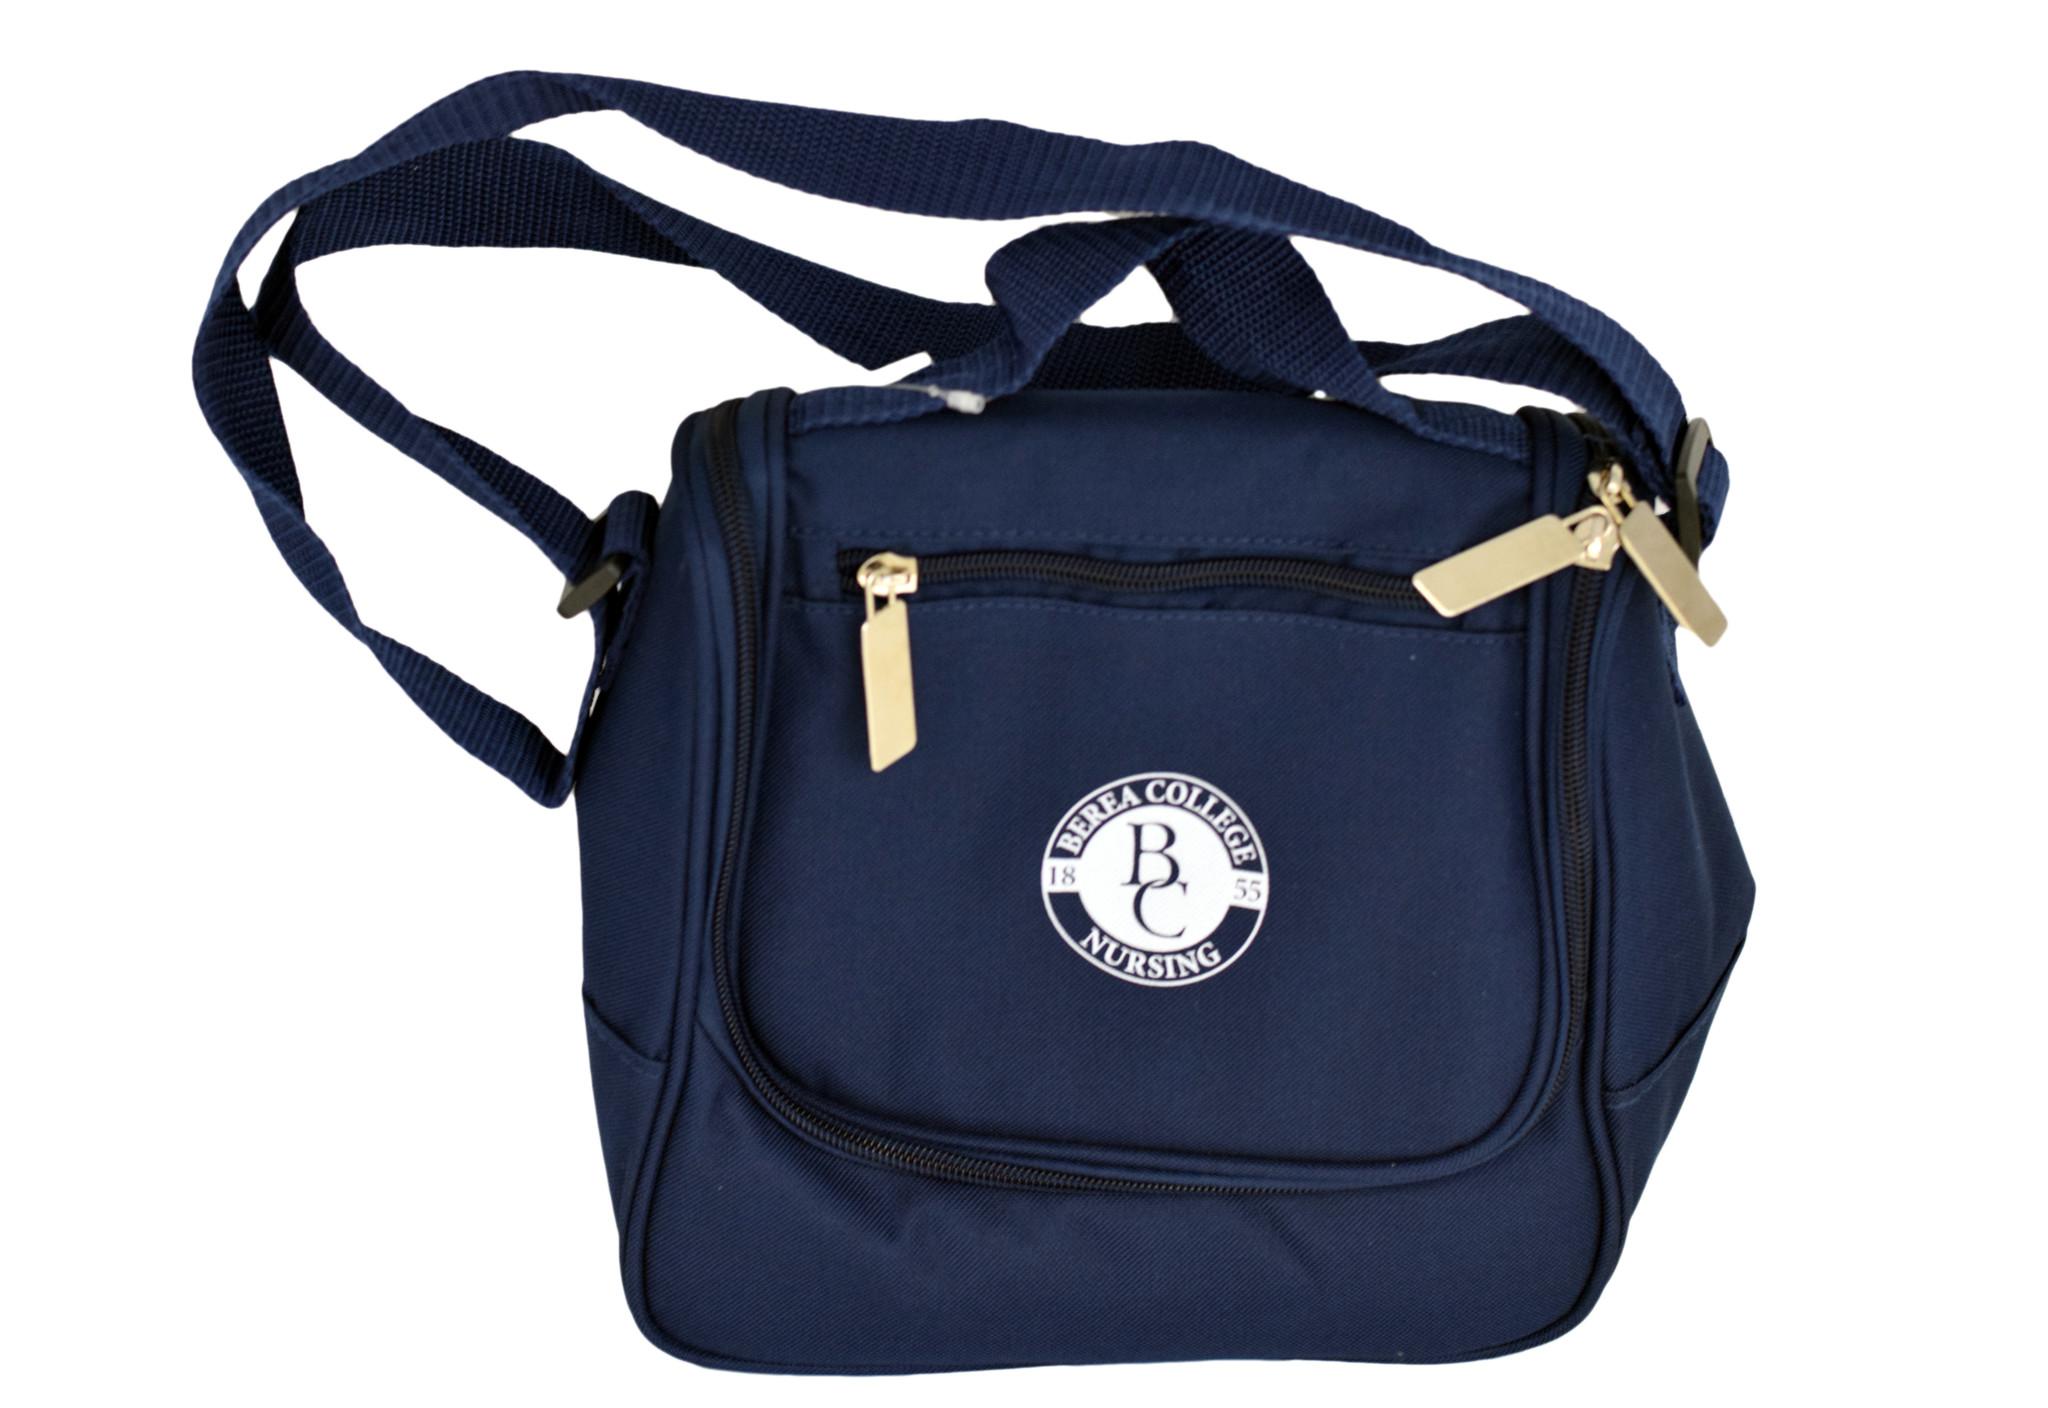 Berea College Nursing Bag-1